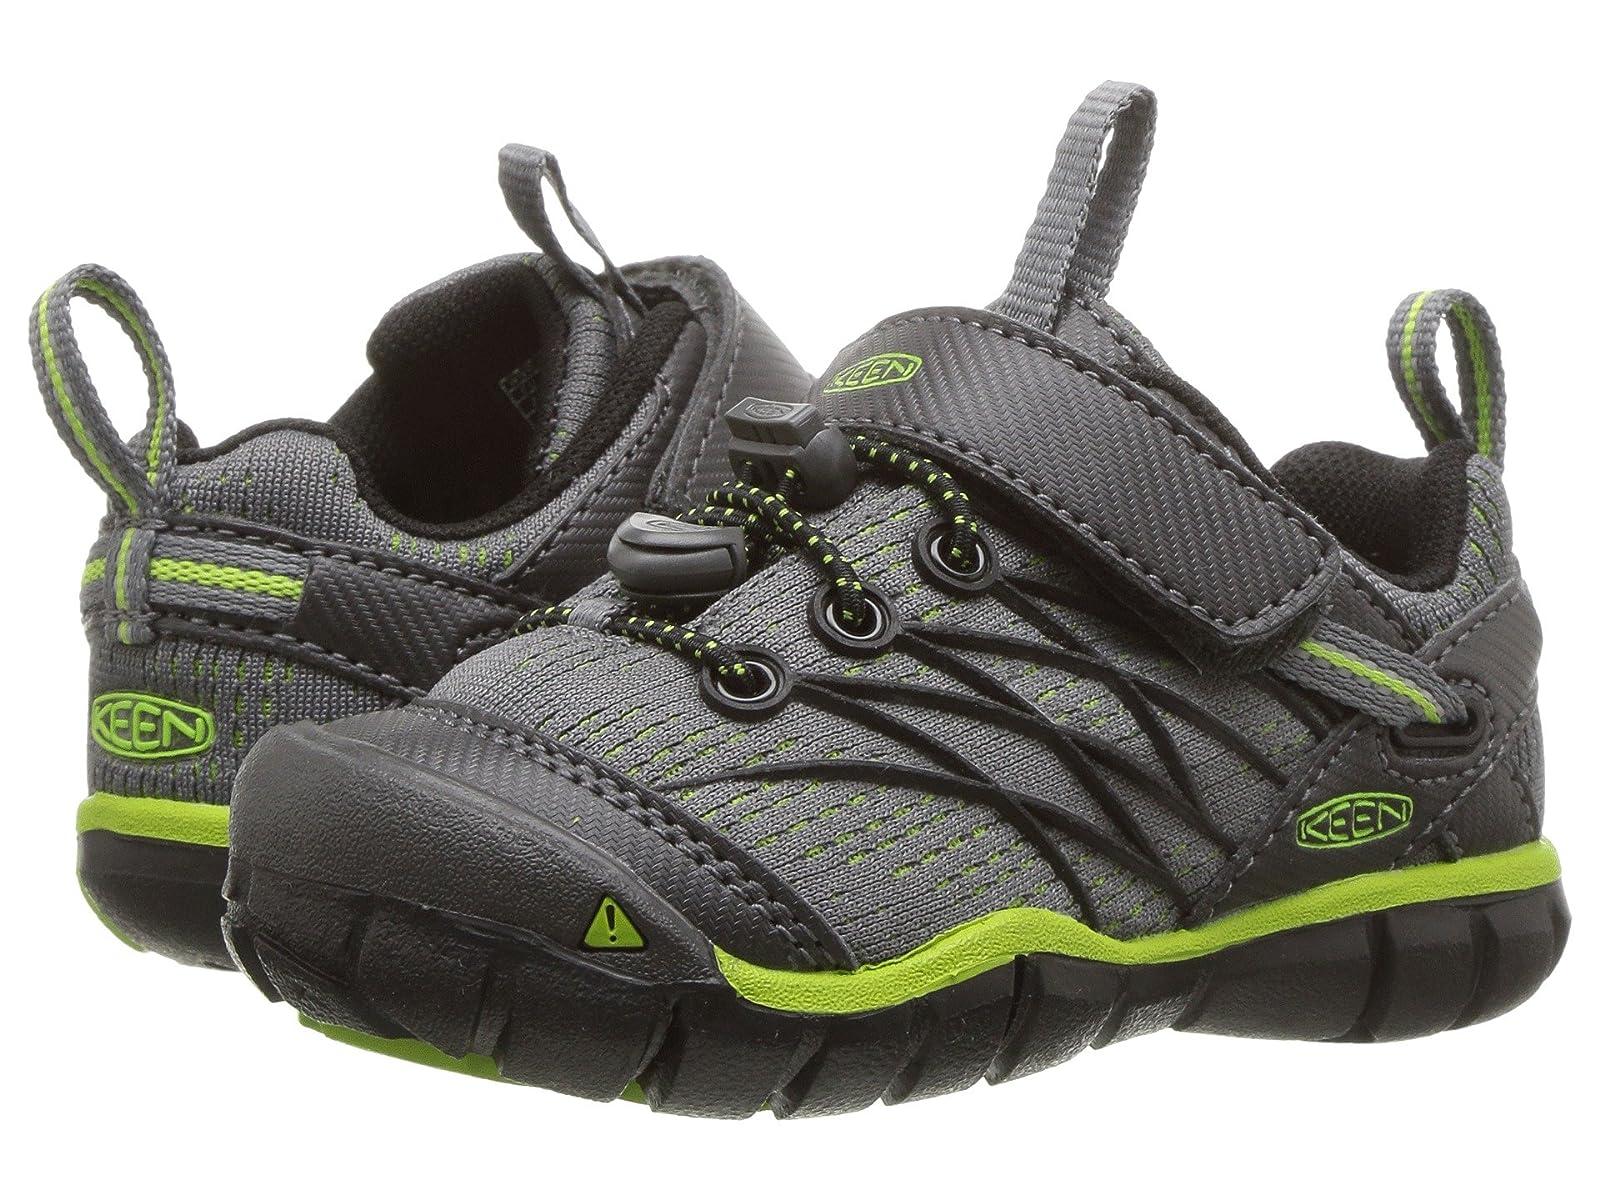 Keen Kids Chandler CNX (Toddler/Little Kid)Atmospheric grades have affordable shoes